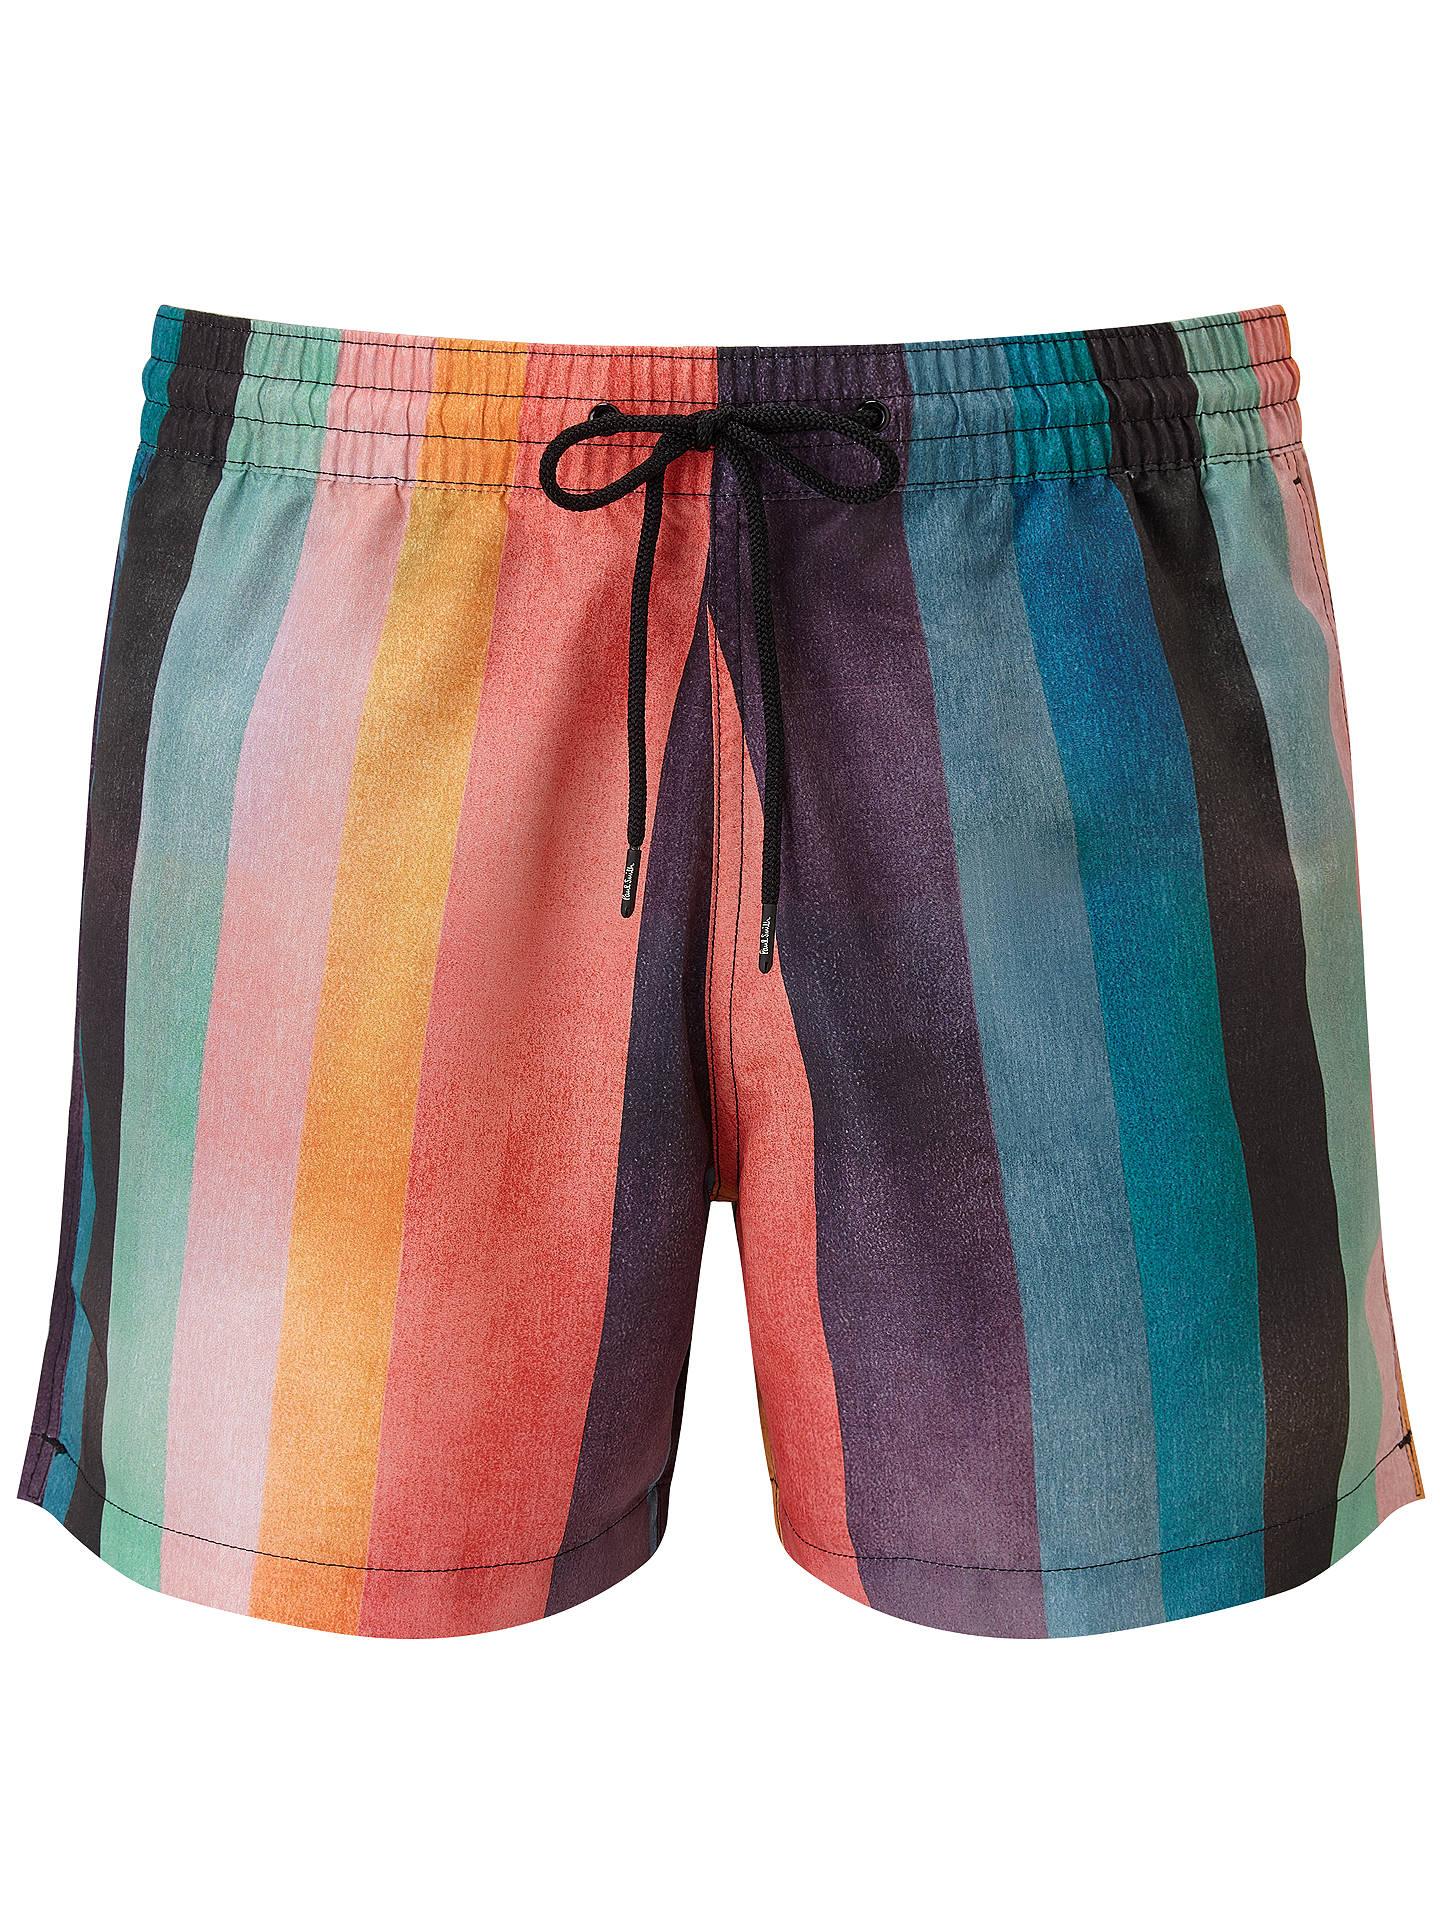 feb451c42b Buy Paul Smith Stripe Swim Shorts, Multi, S Online at johnlewis.com ...